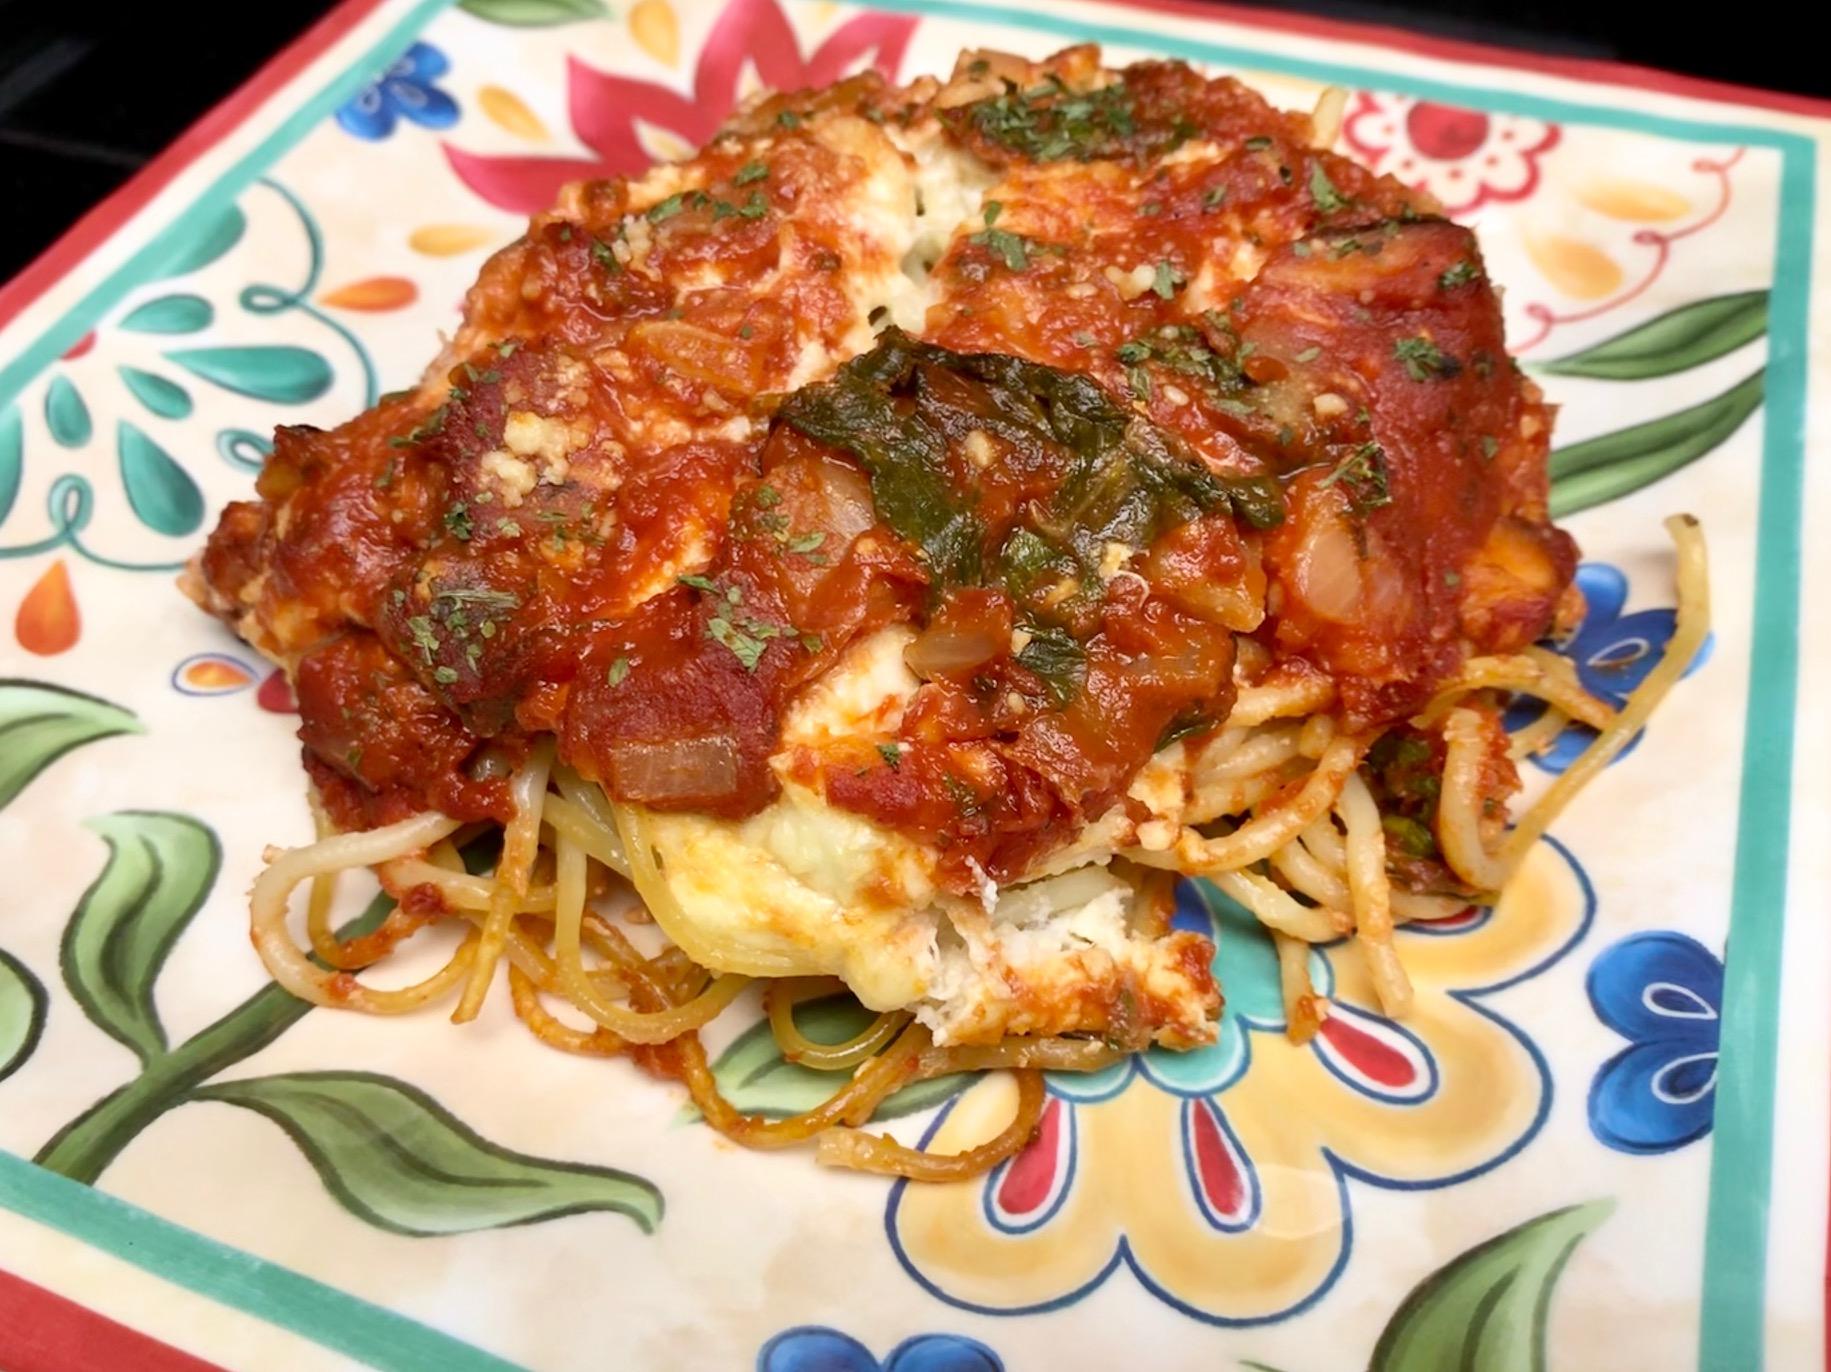 Spaghetti Lasagna Florentine with Crab